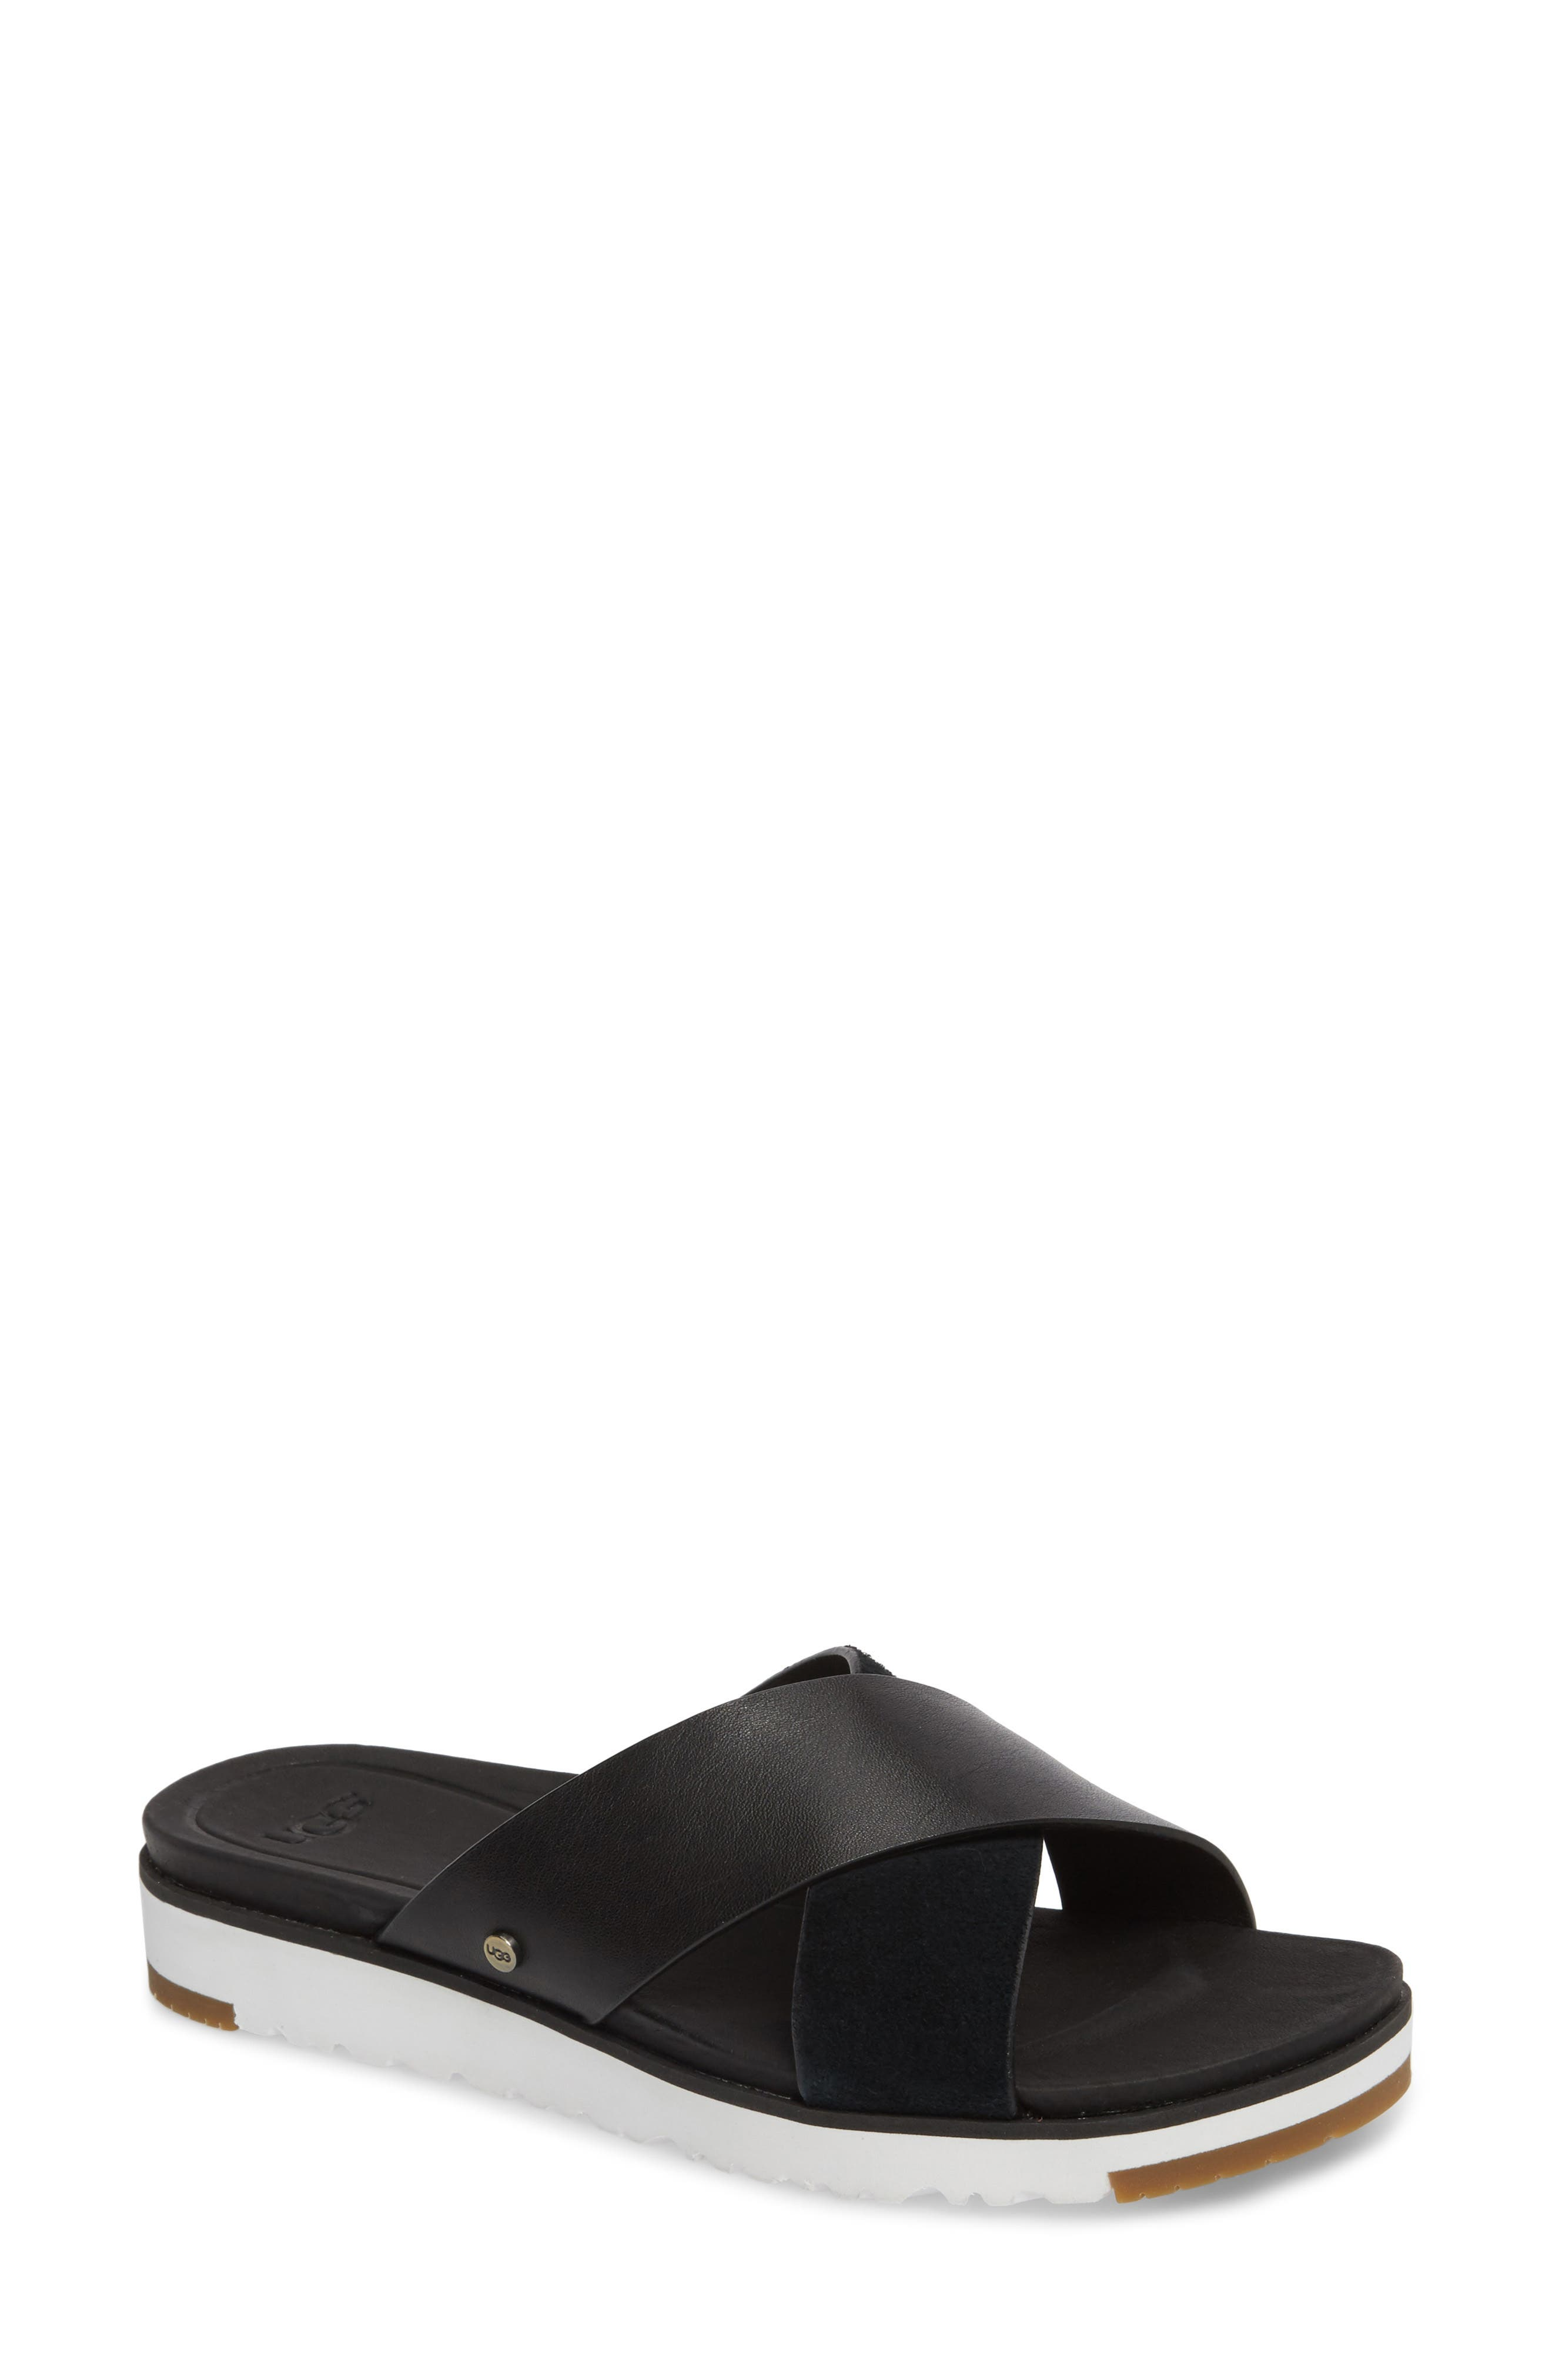 UGG<SUP>®</SUP> 'Kari' Sandal, Main, color, BLACK